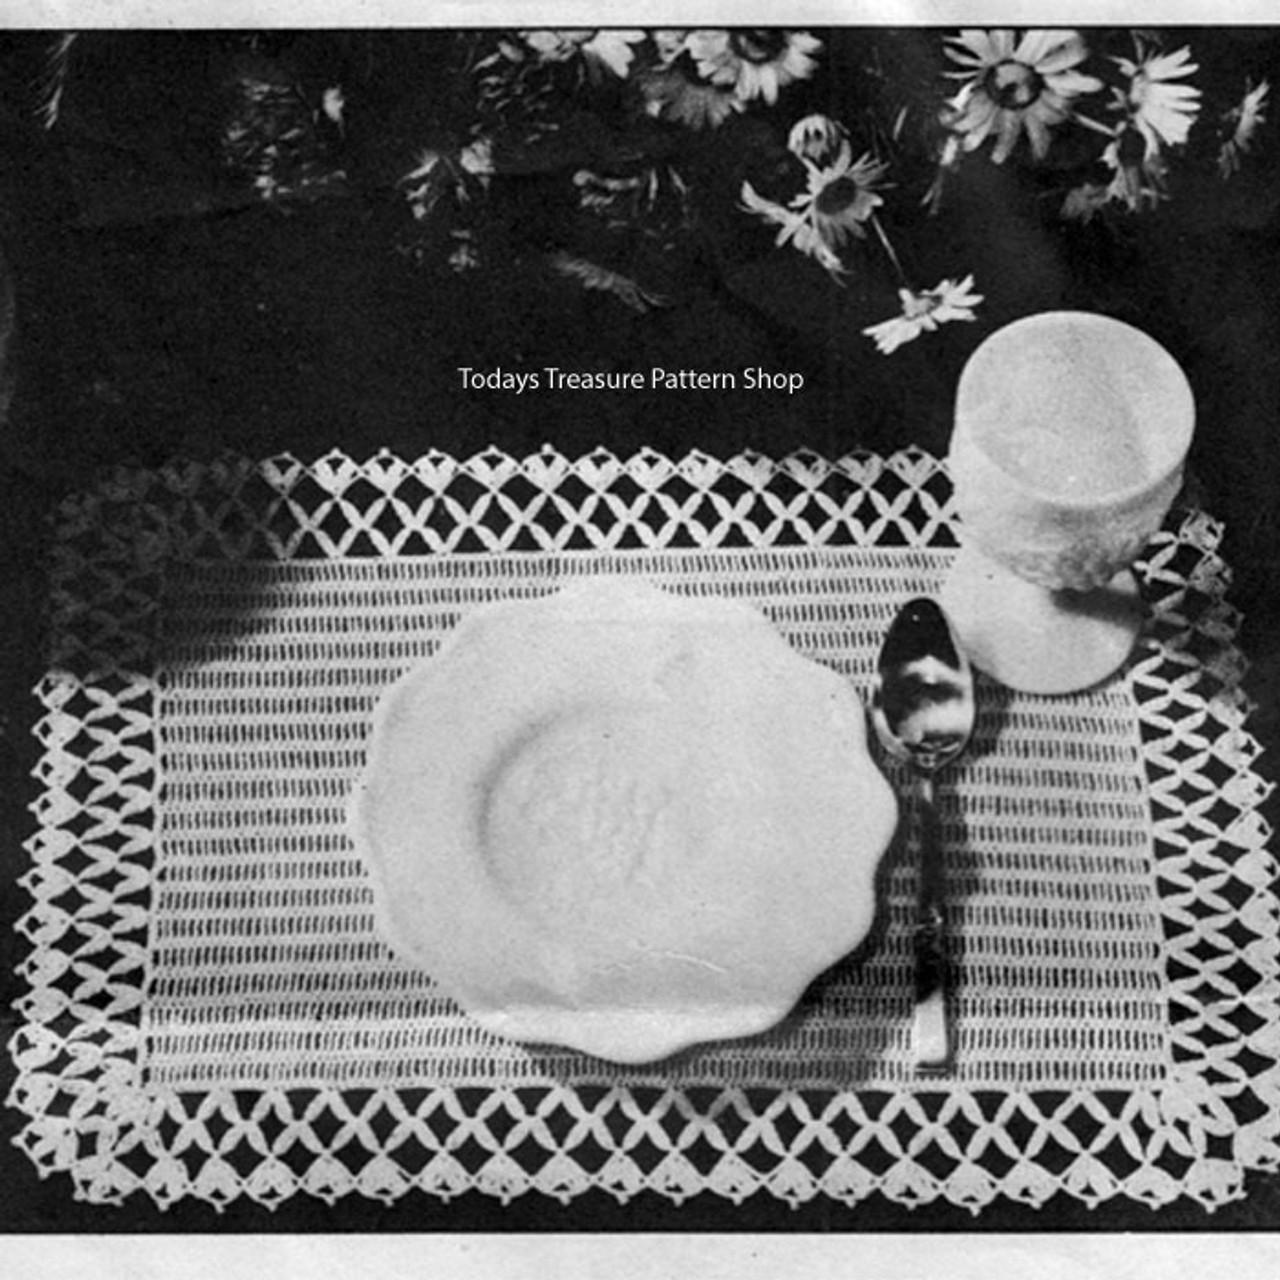 Vintage Lattice Place Mats Crochet Pattern